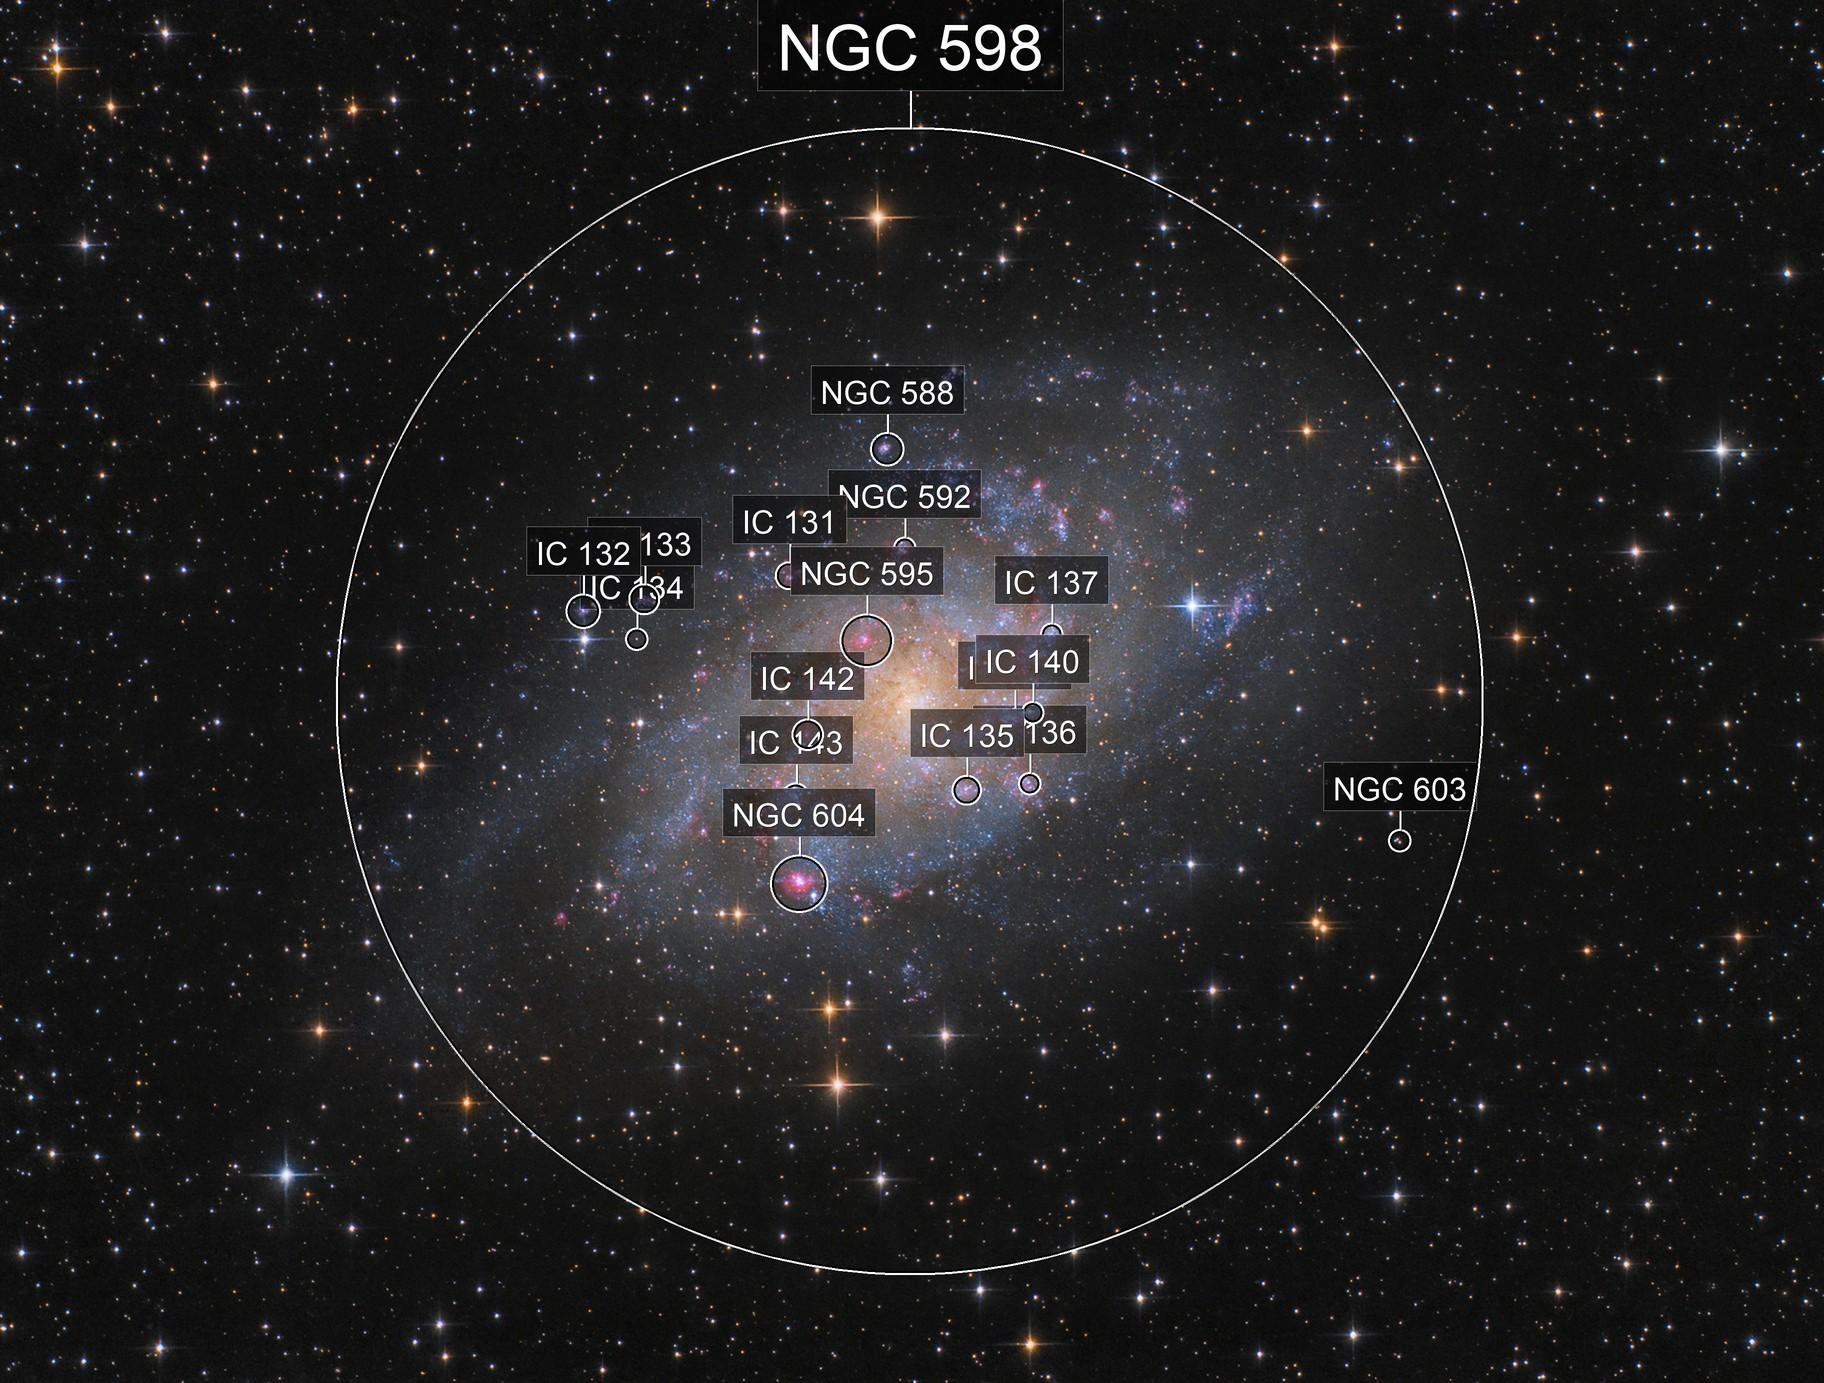 M 33 - Triangulum Galaxy